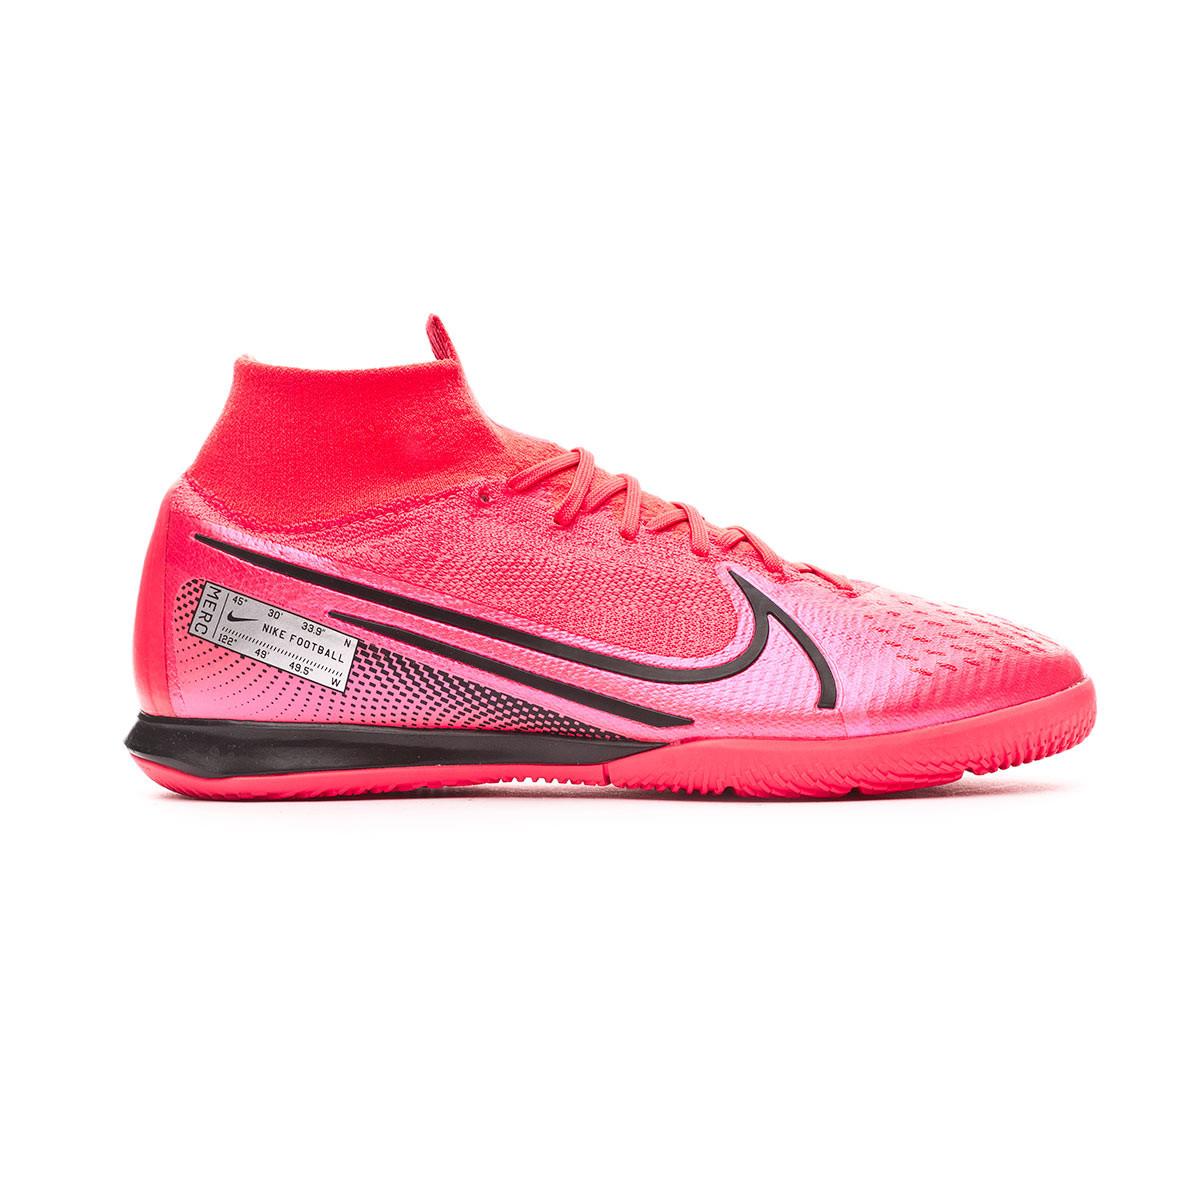 Marca Esportiva Chuteira Nike Mercurial SuperflyX 6 Elite IC